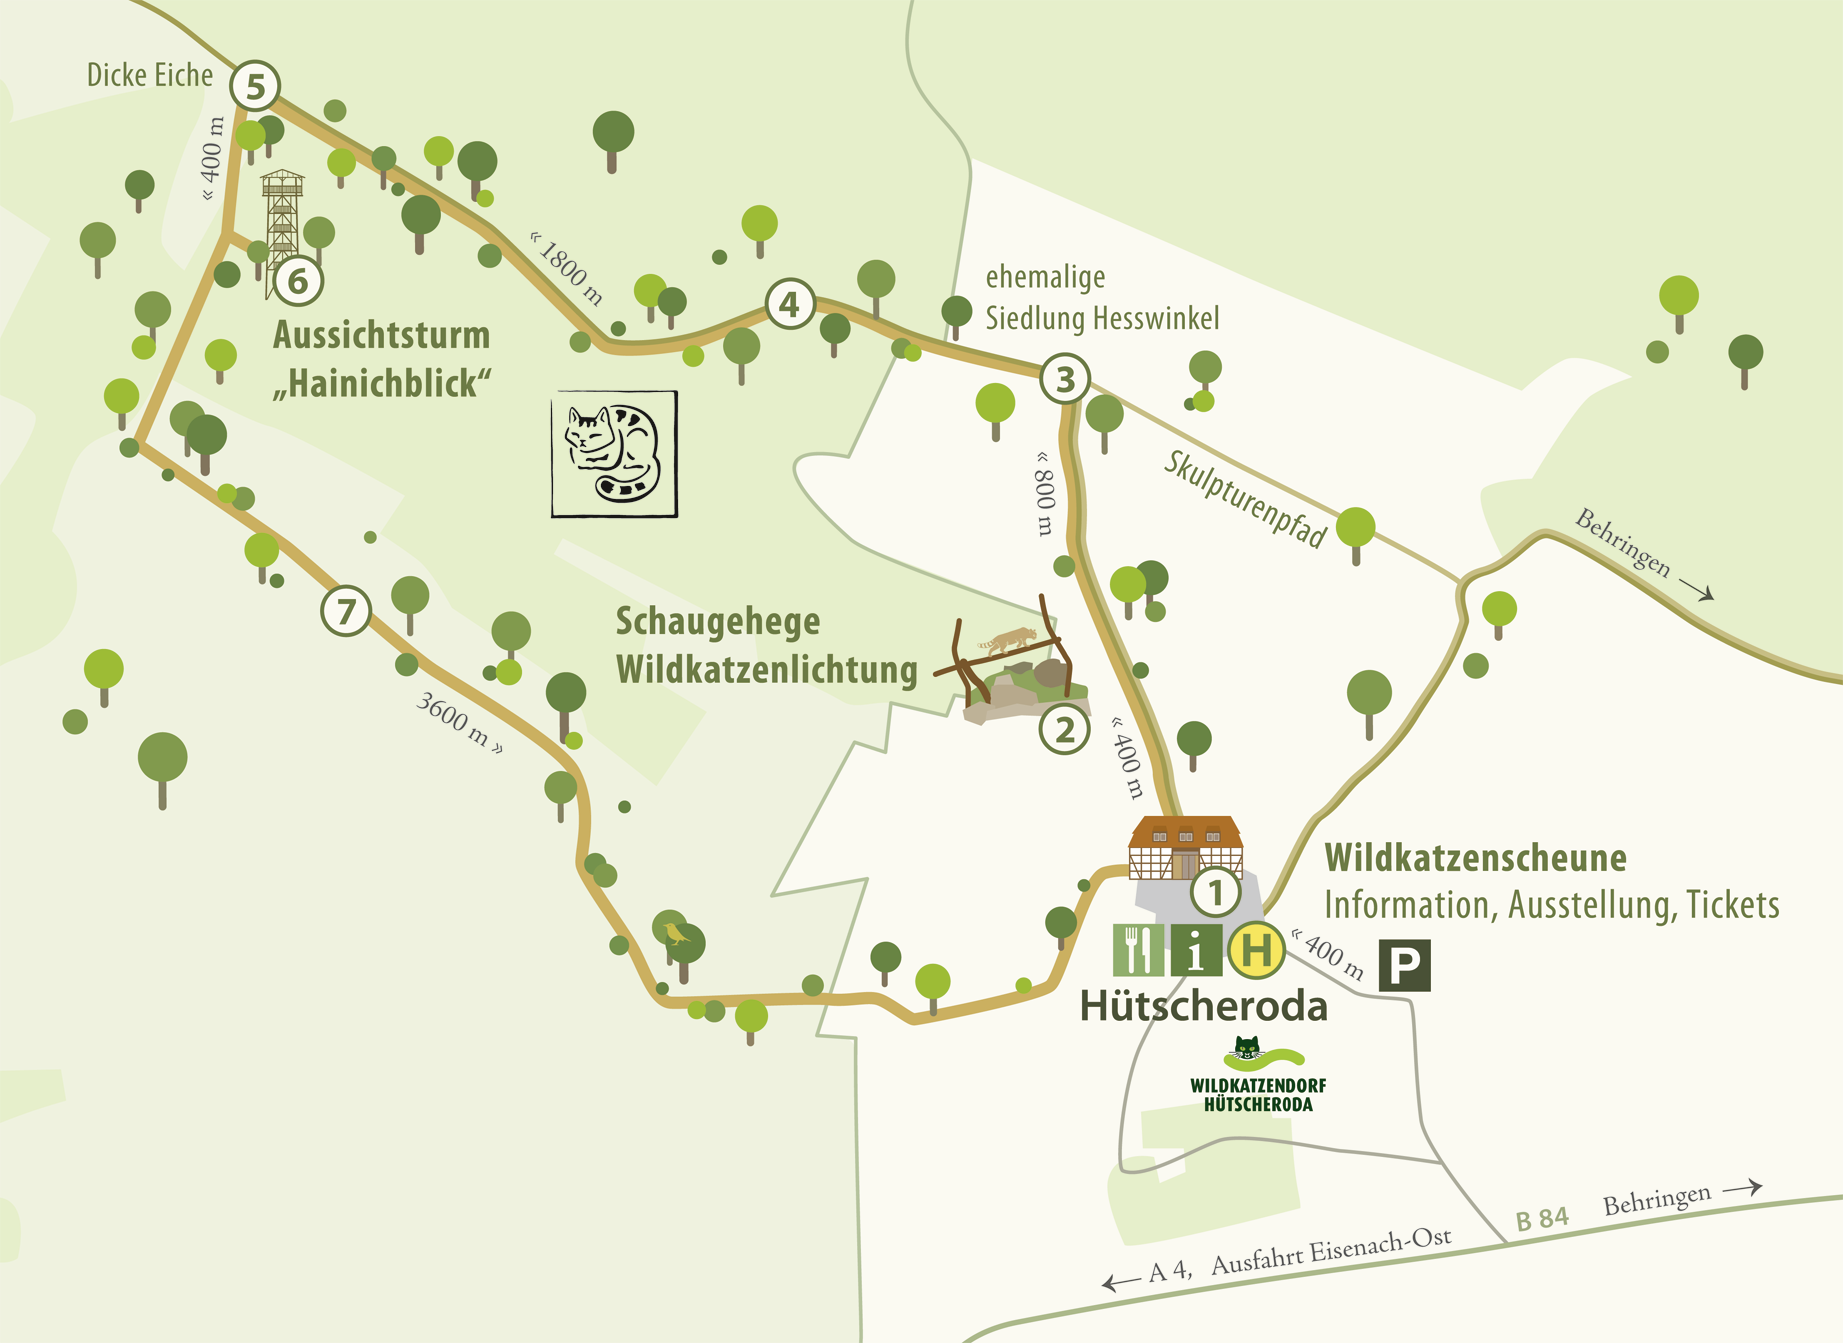 Grafik: Kartendarstellung des Wildkatzendorfes Hütscheroda